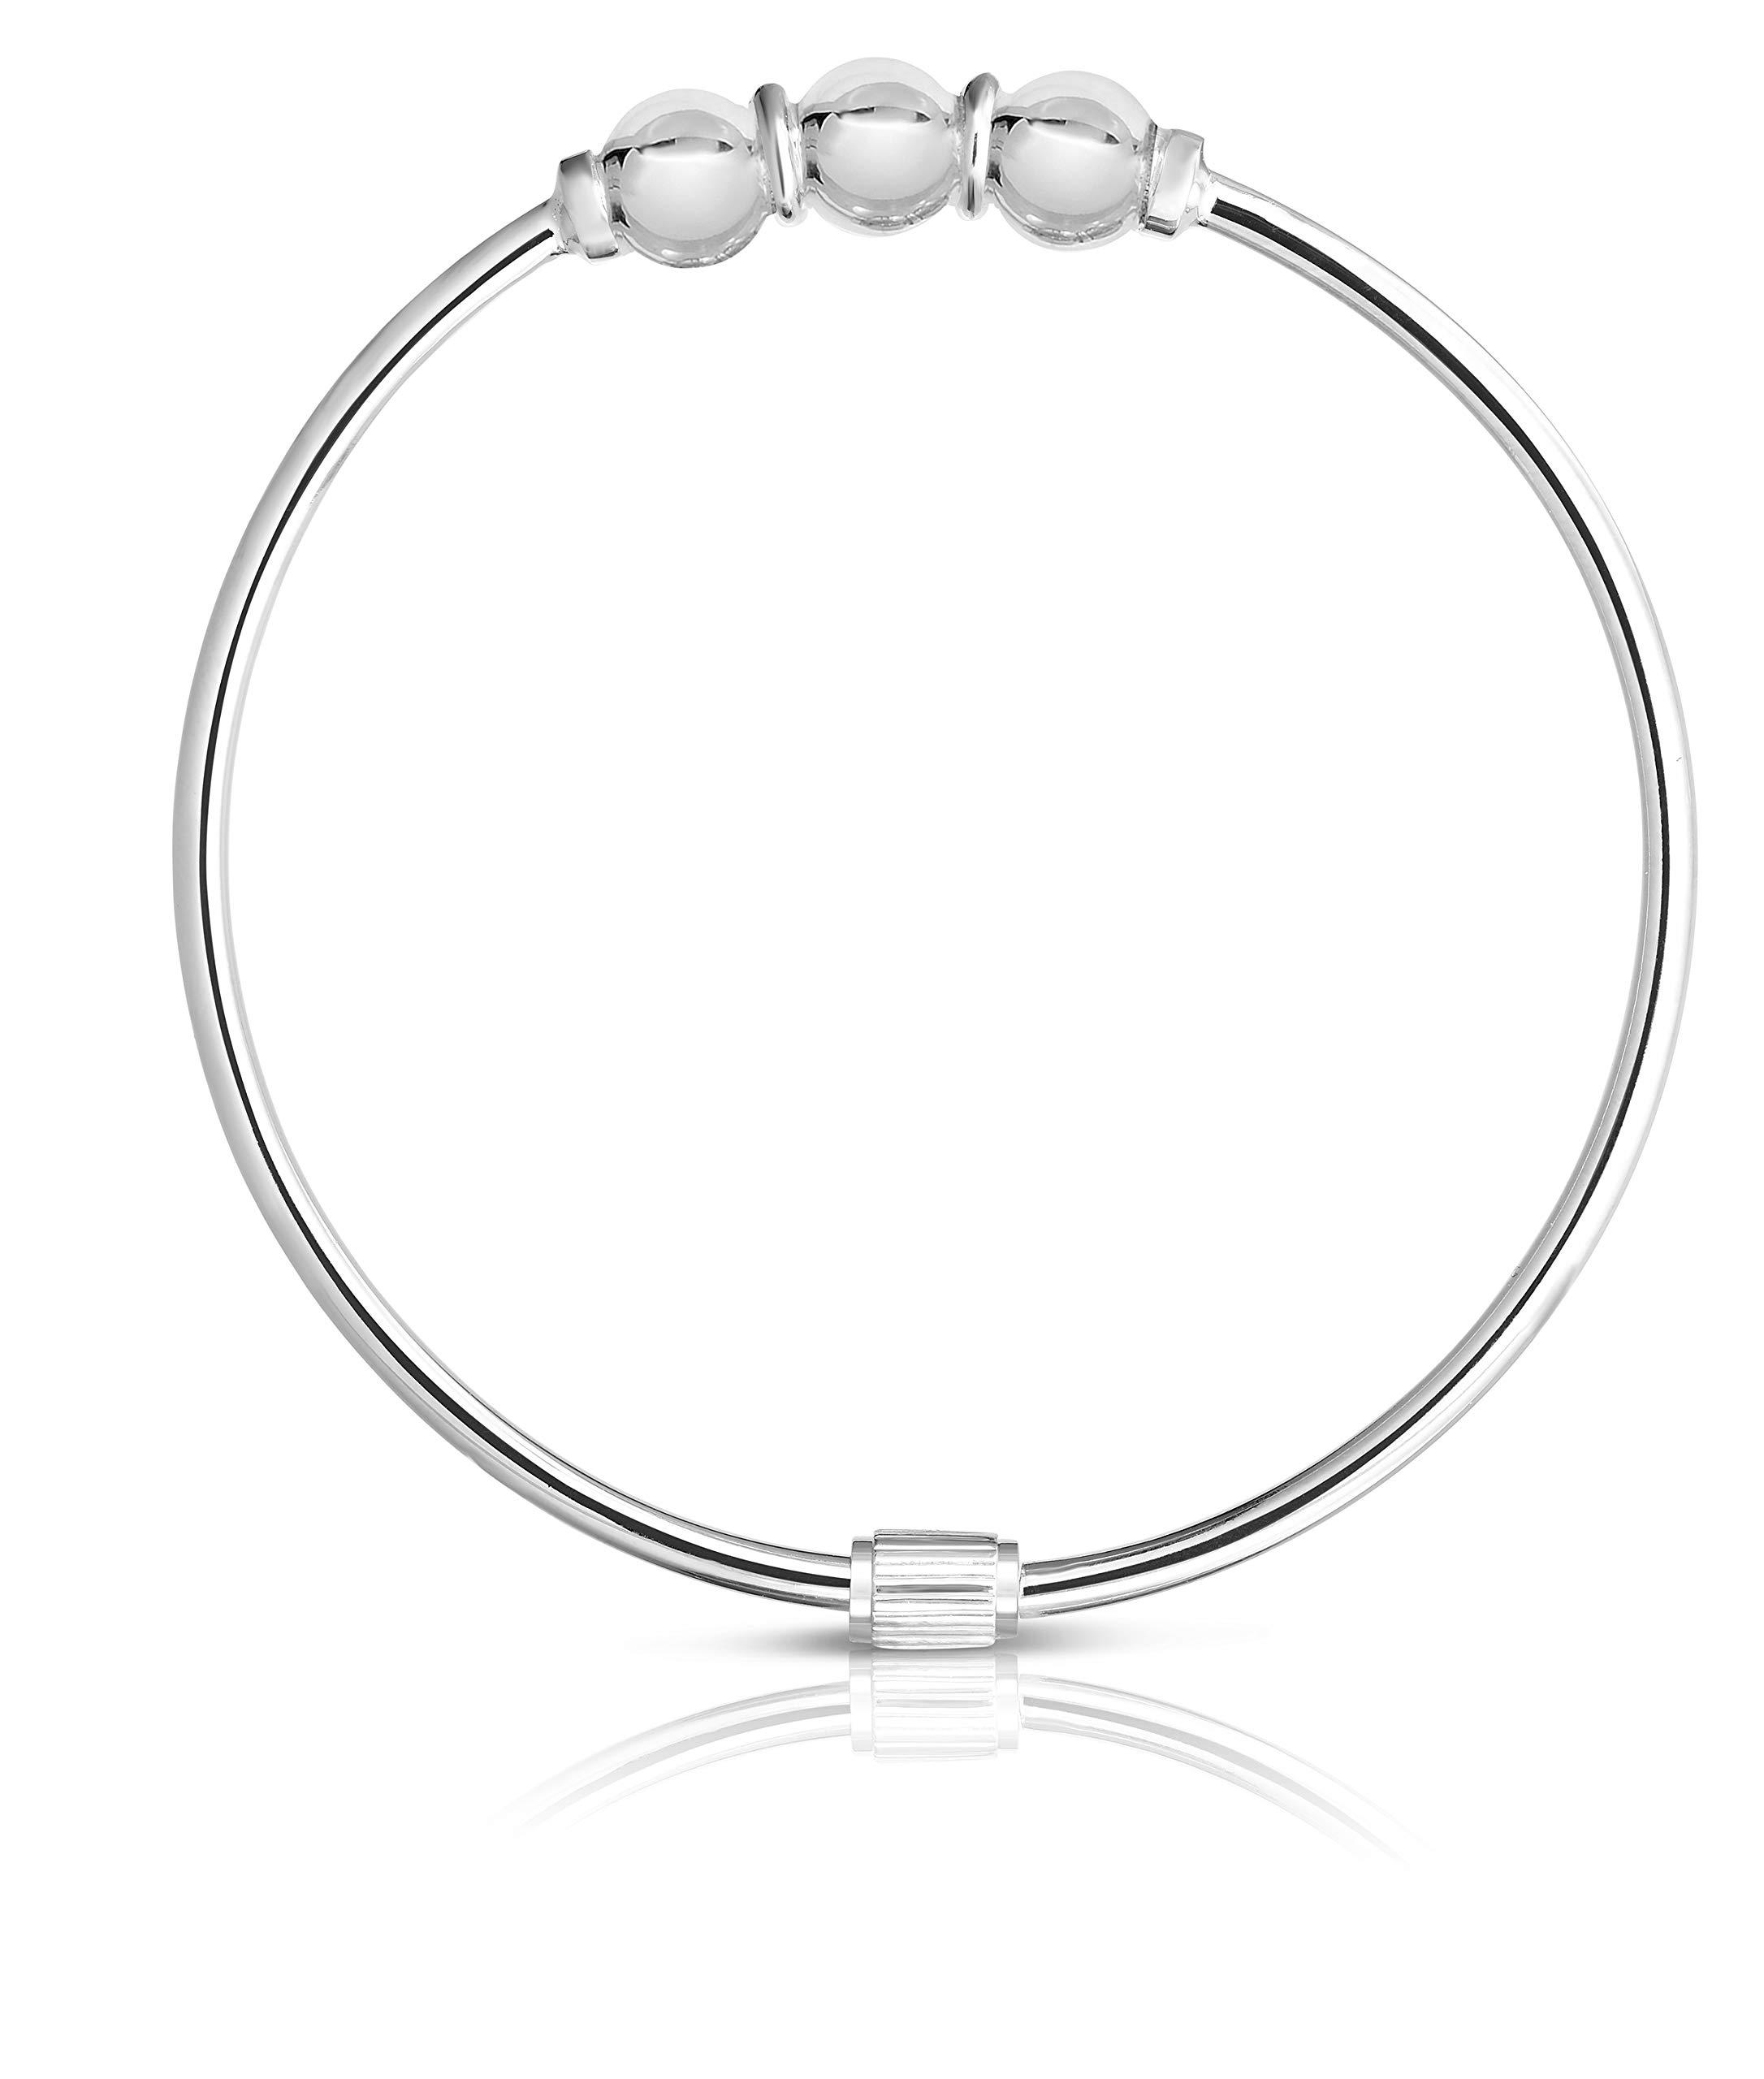 Unique Royal Jewelry Solid 925 Sterling Silver Triple Ball Designer Cape COD Beach Bracelet Bangle. (Sterling Silver Size-6.5) by Unique Royal Jewelry (Image #1)